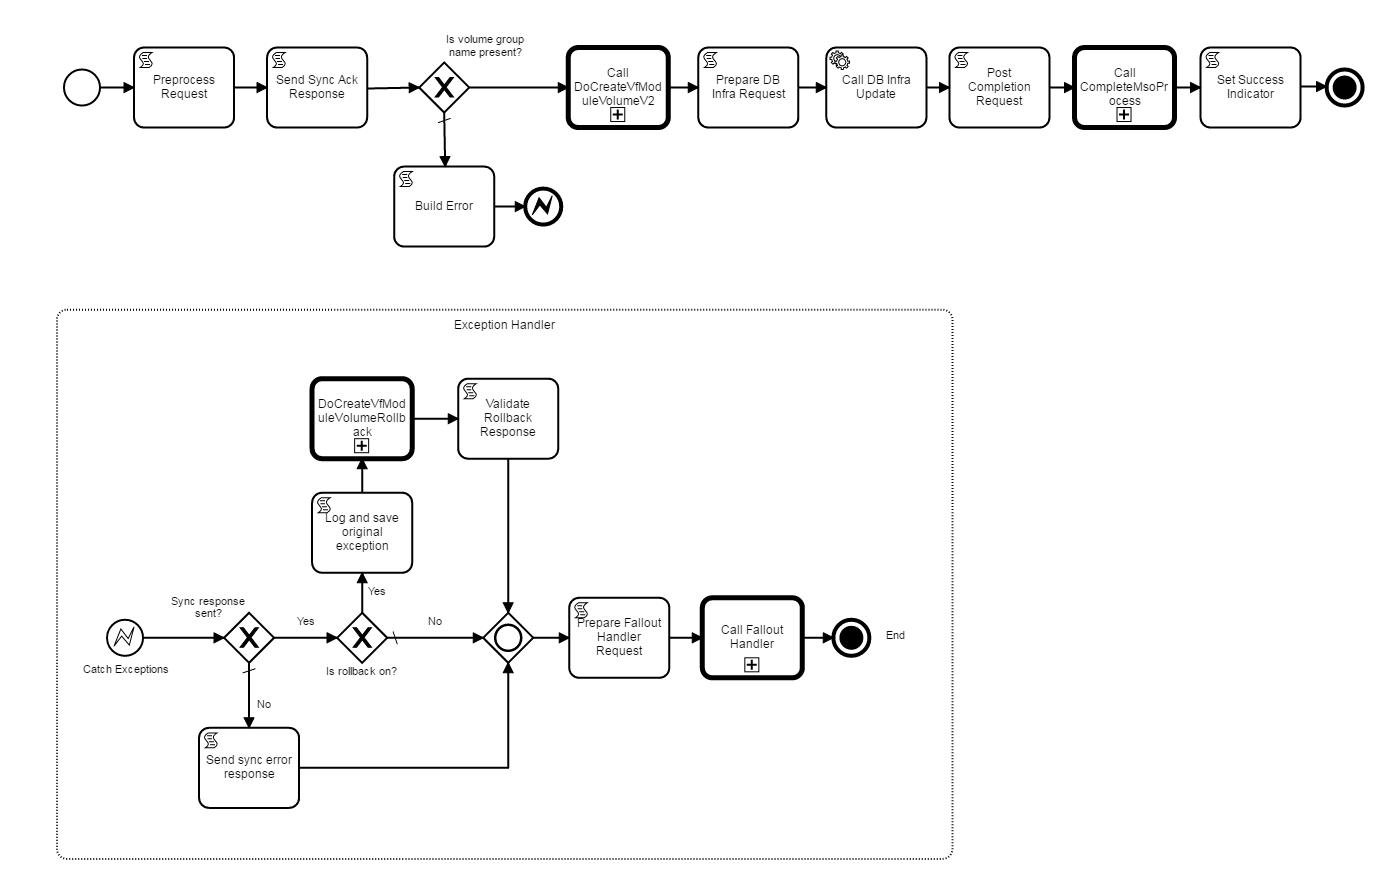 Bpmn main process flows developer wiki confluence example createvfmodulevolumeinfrav1bpmn ccuart Image collections